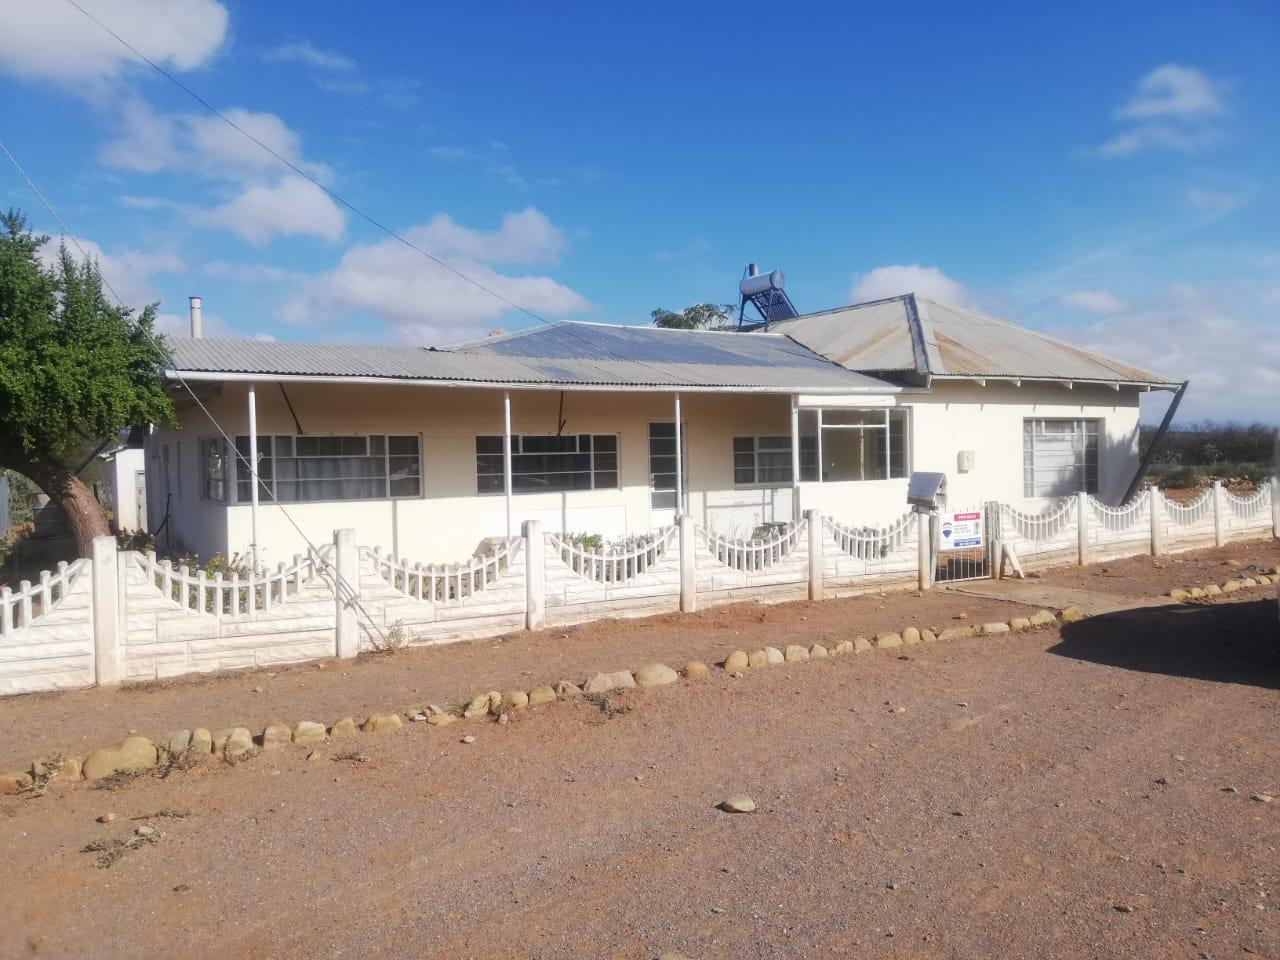 4 bedroom House in Steytlerville | RE/MAX